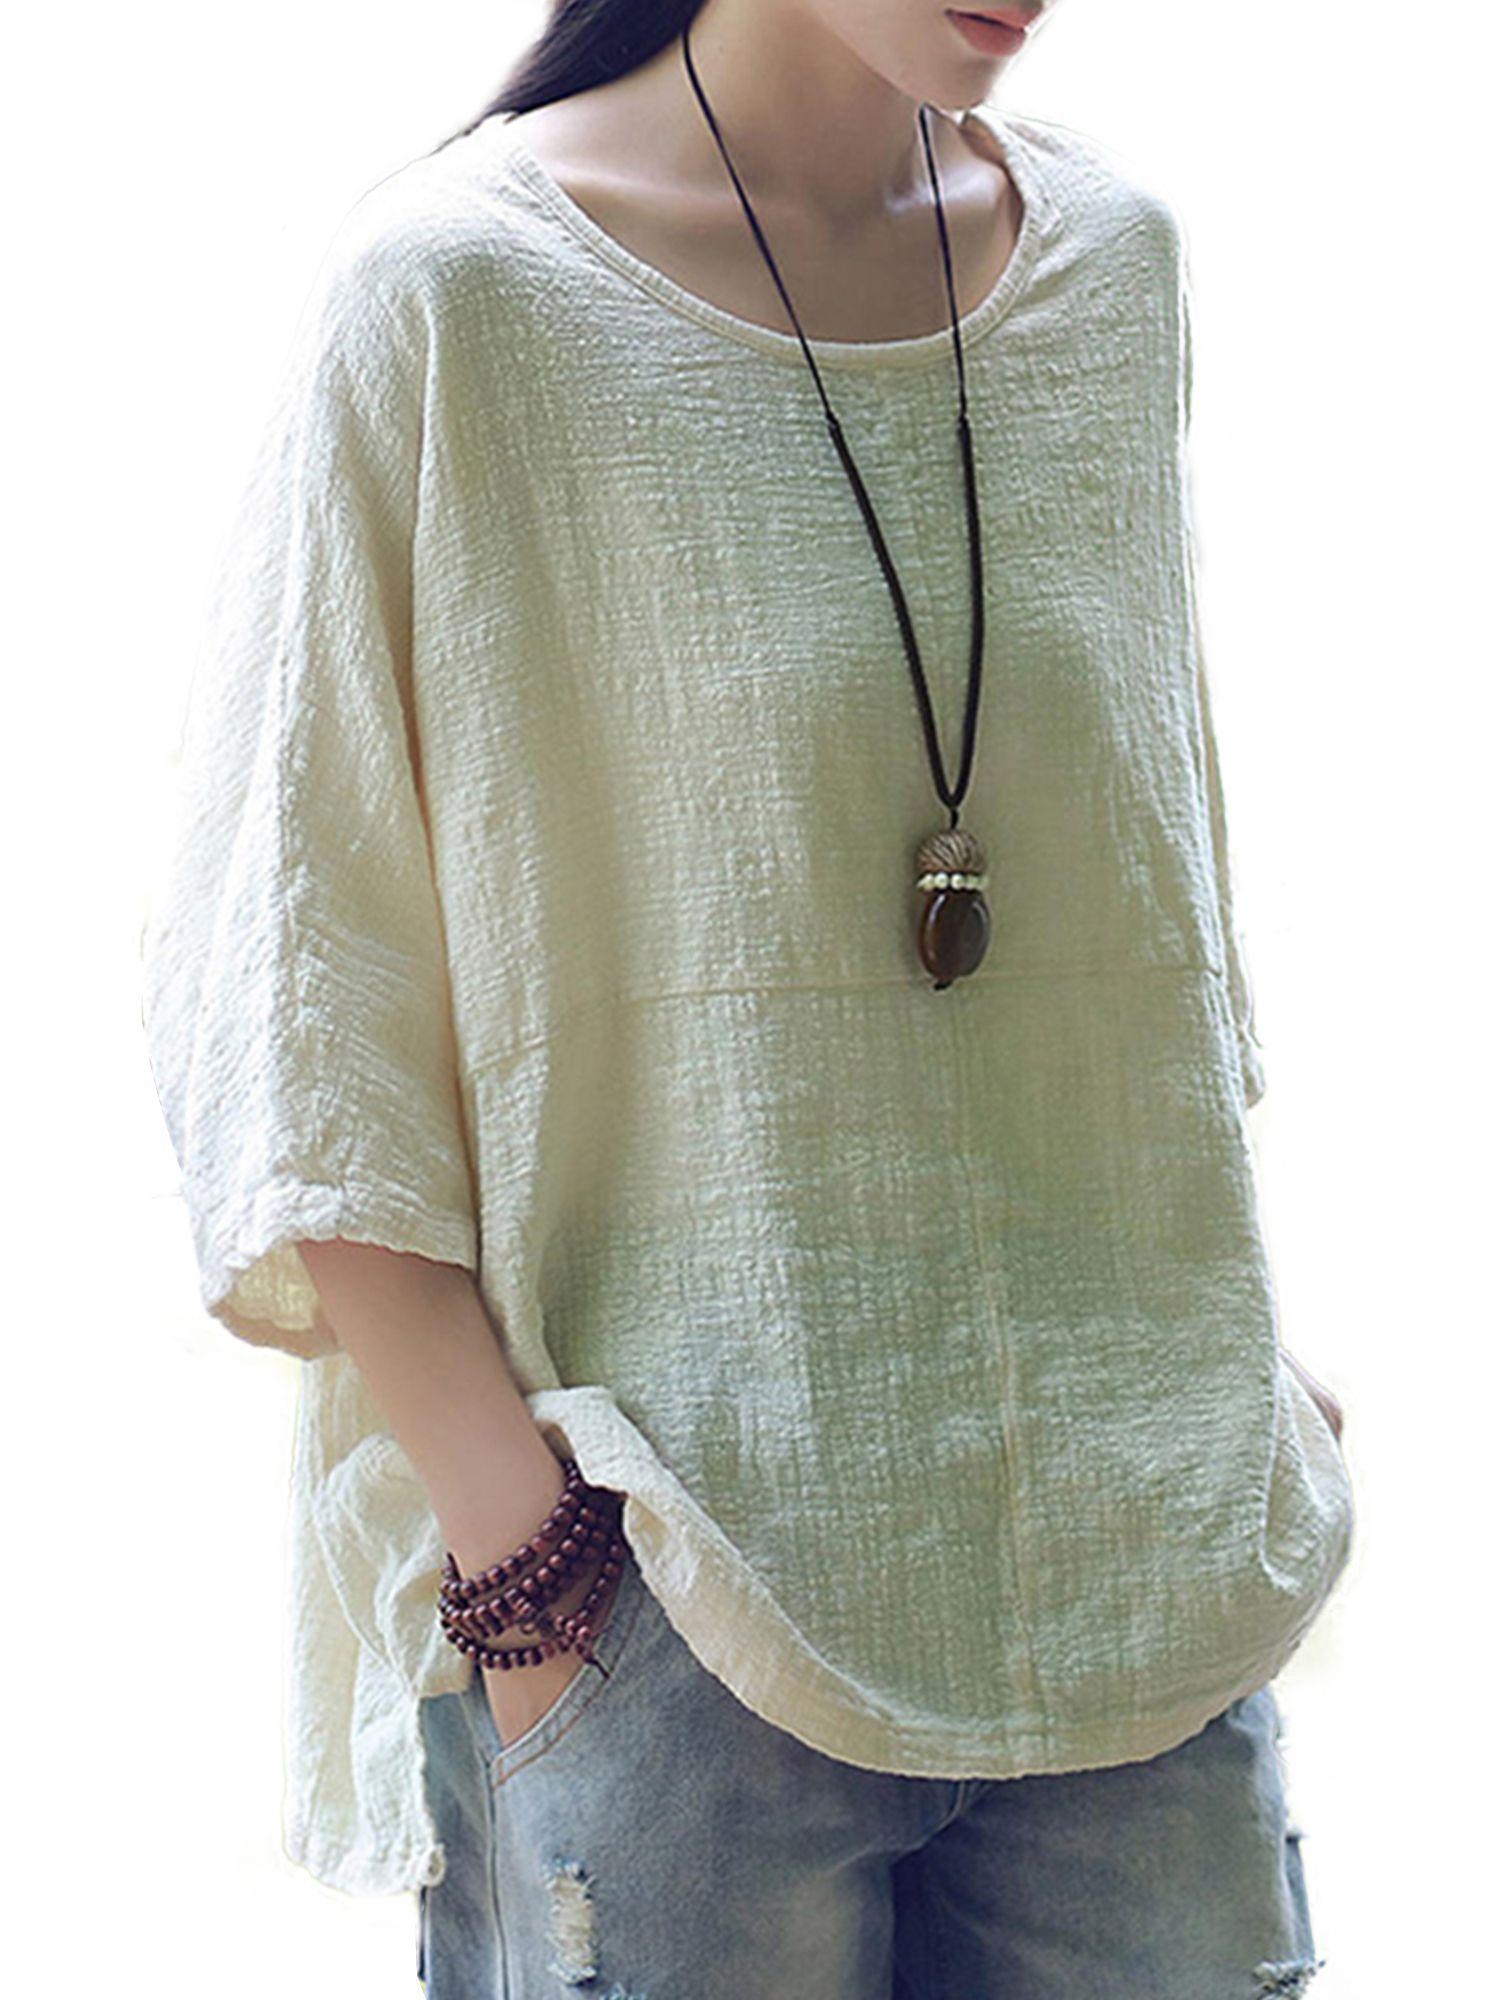 Vintage Women/'s Casual 3//4 Sleeve Baggy Cotton Linen T-Shirt Tops Blouse Tee